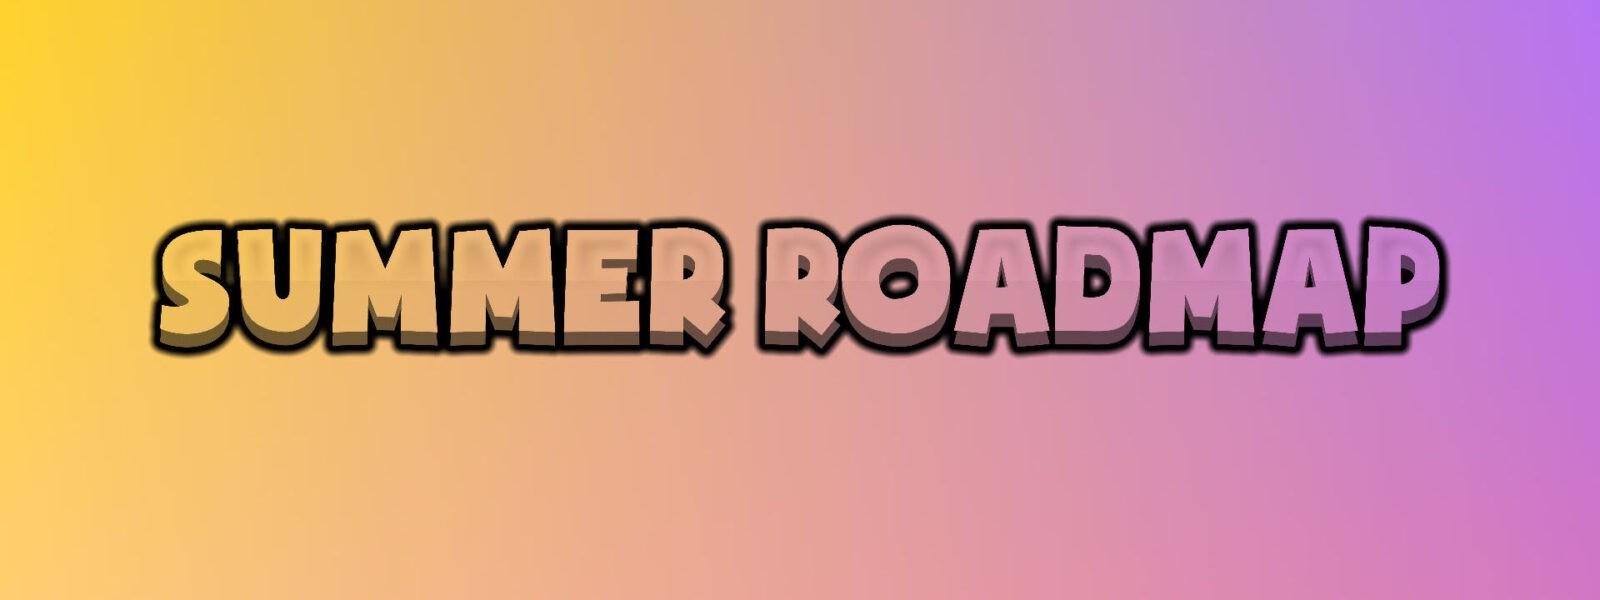 Summer 2021 Roadmap